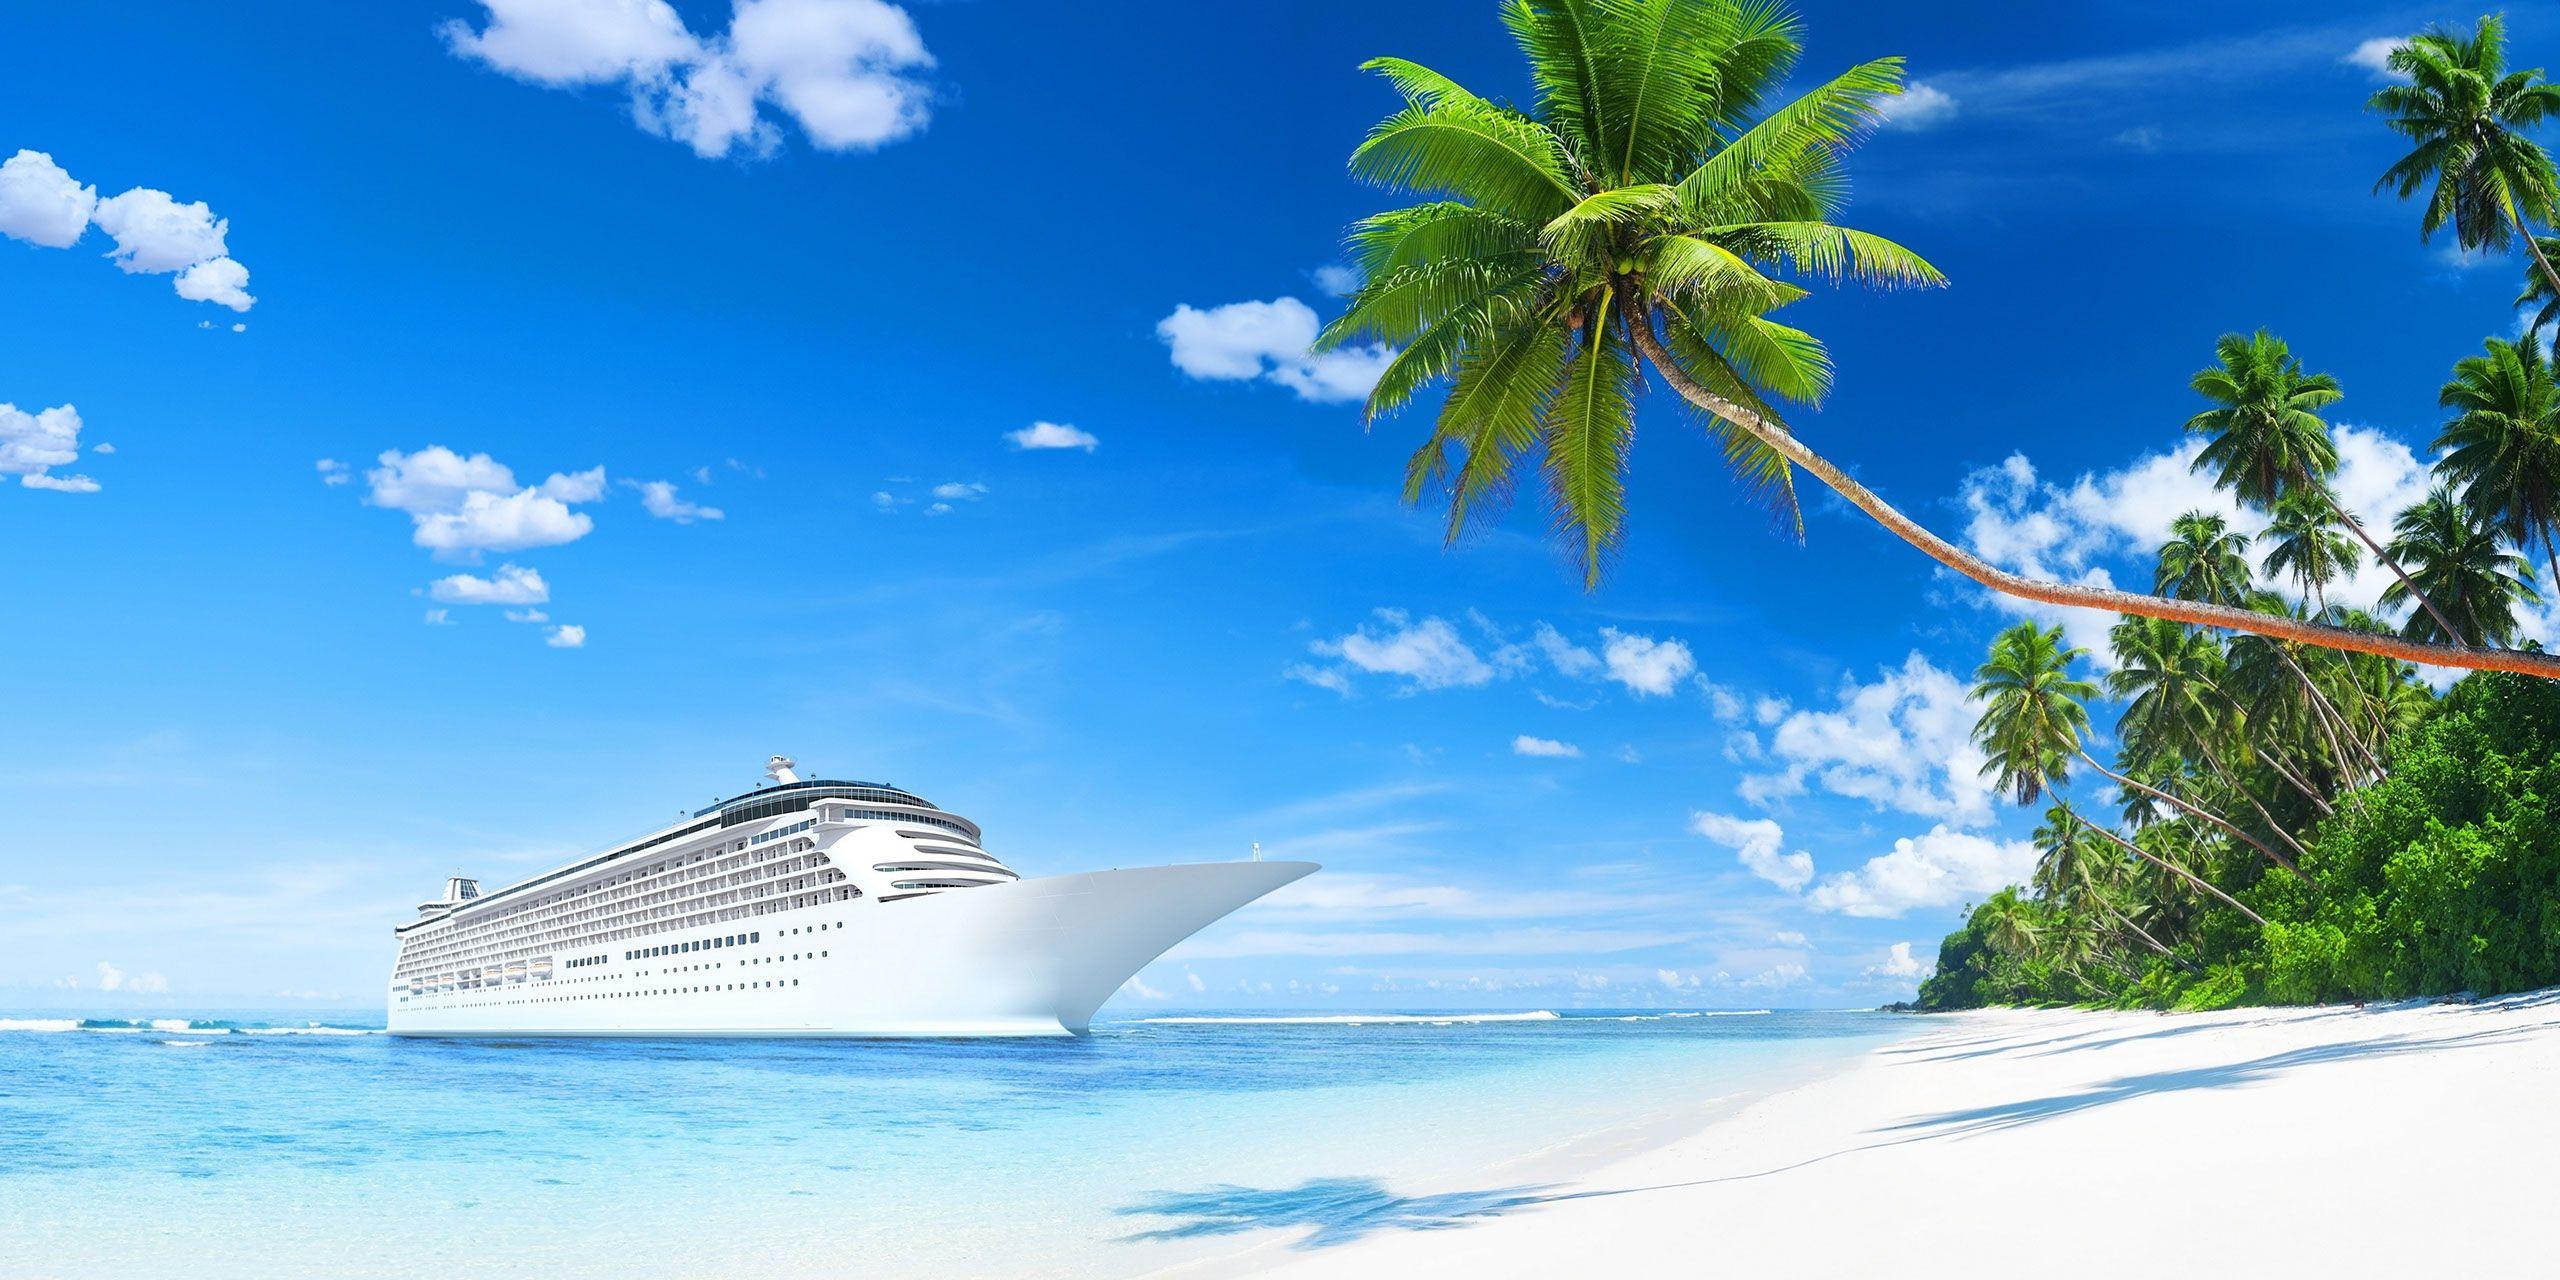 Great America Travel Club sells travel club memberships